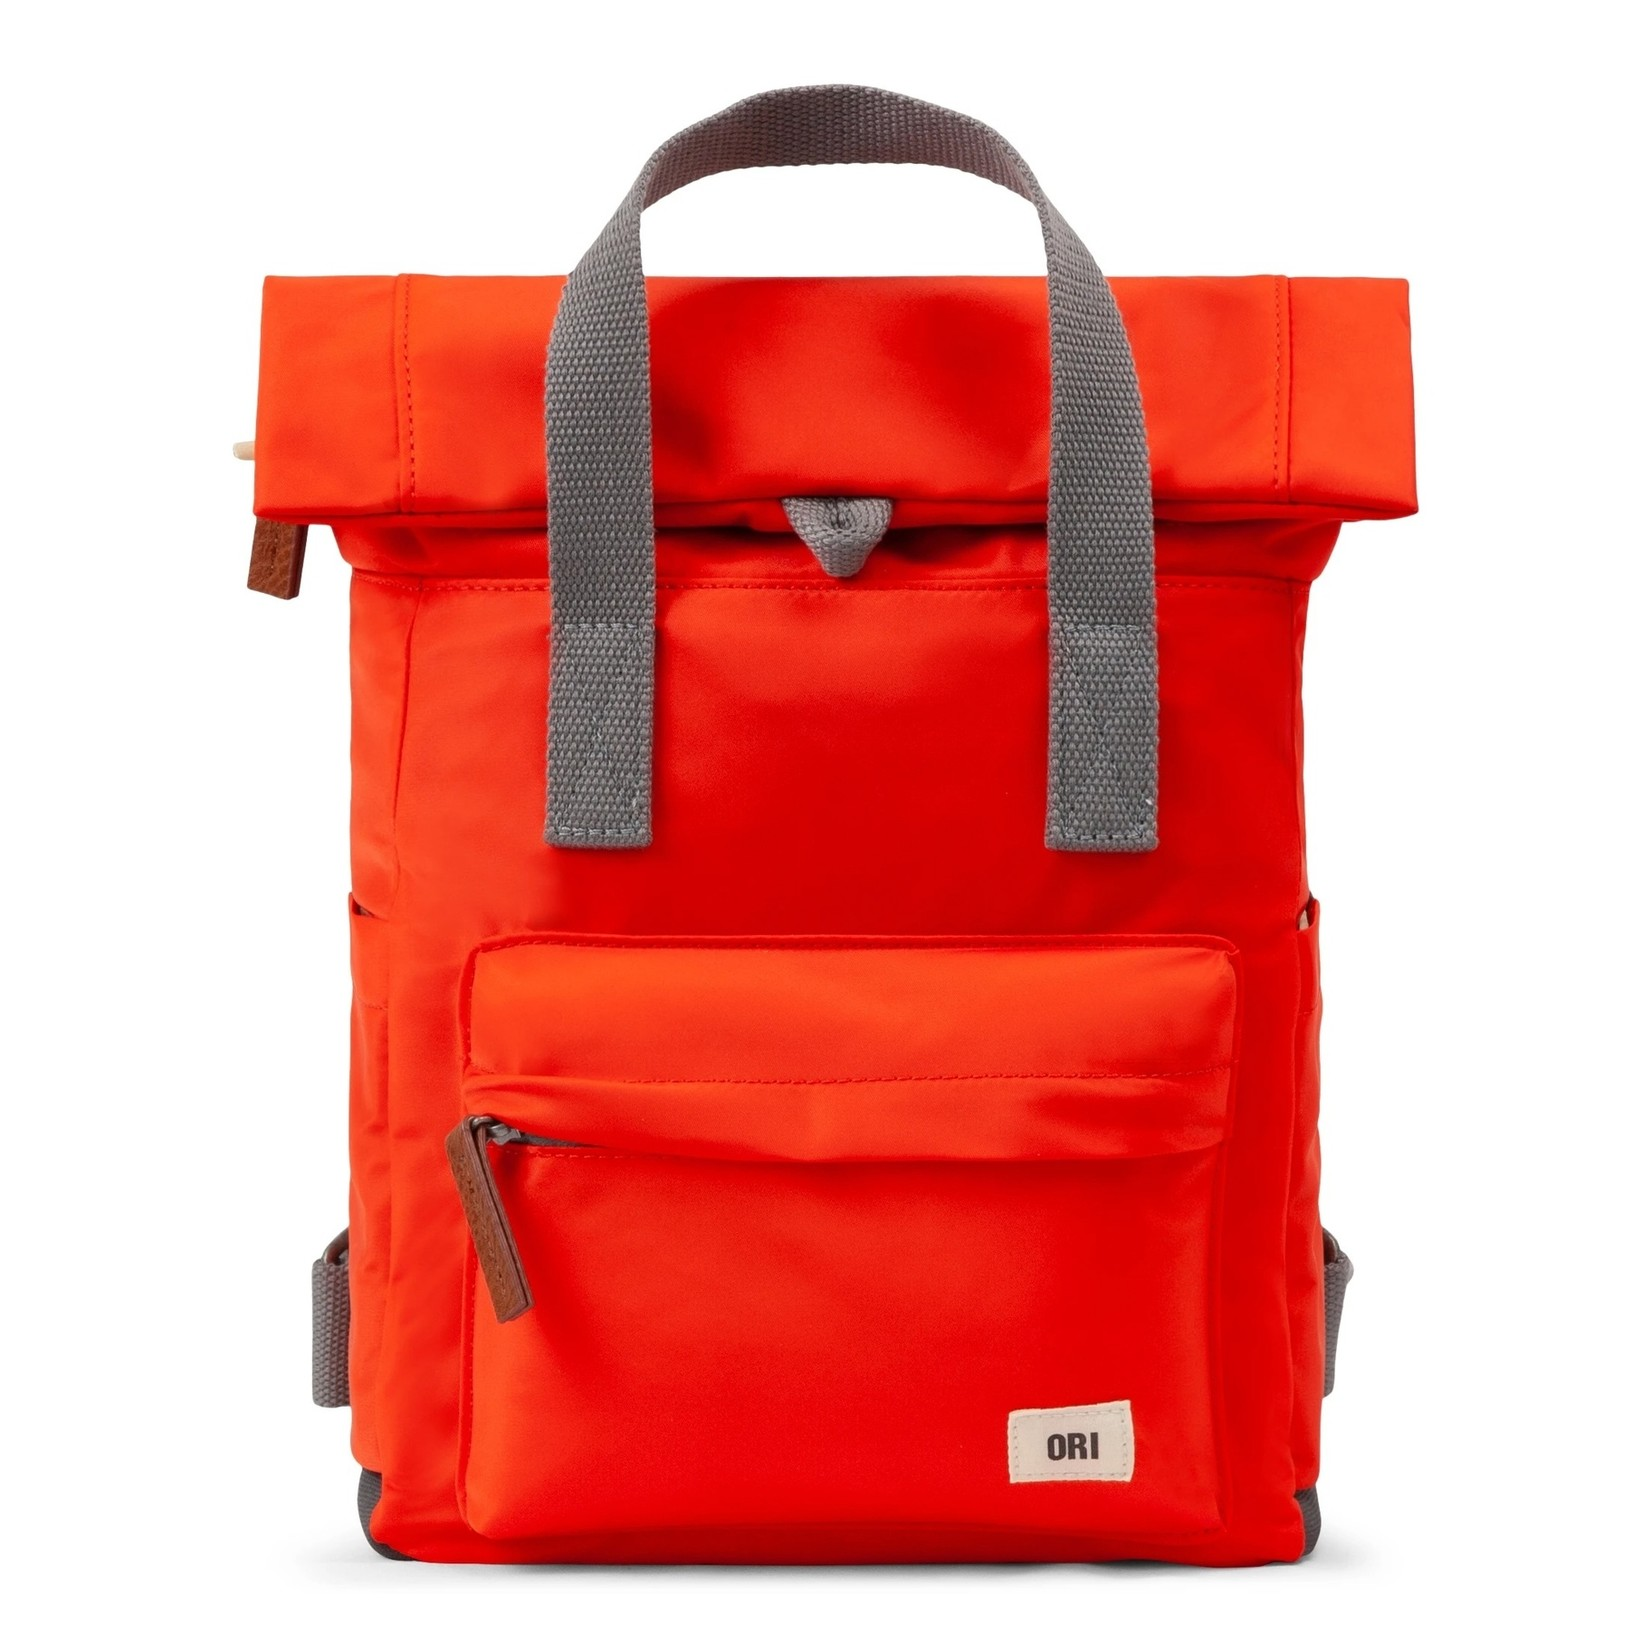 Ori London Canfield B Medium Backpack Neon Red